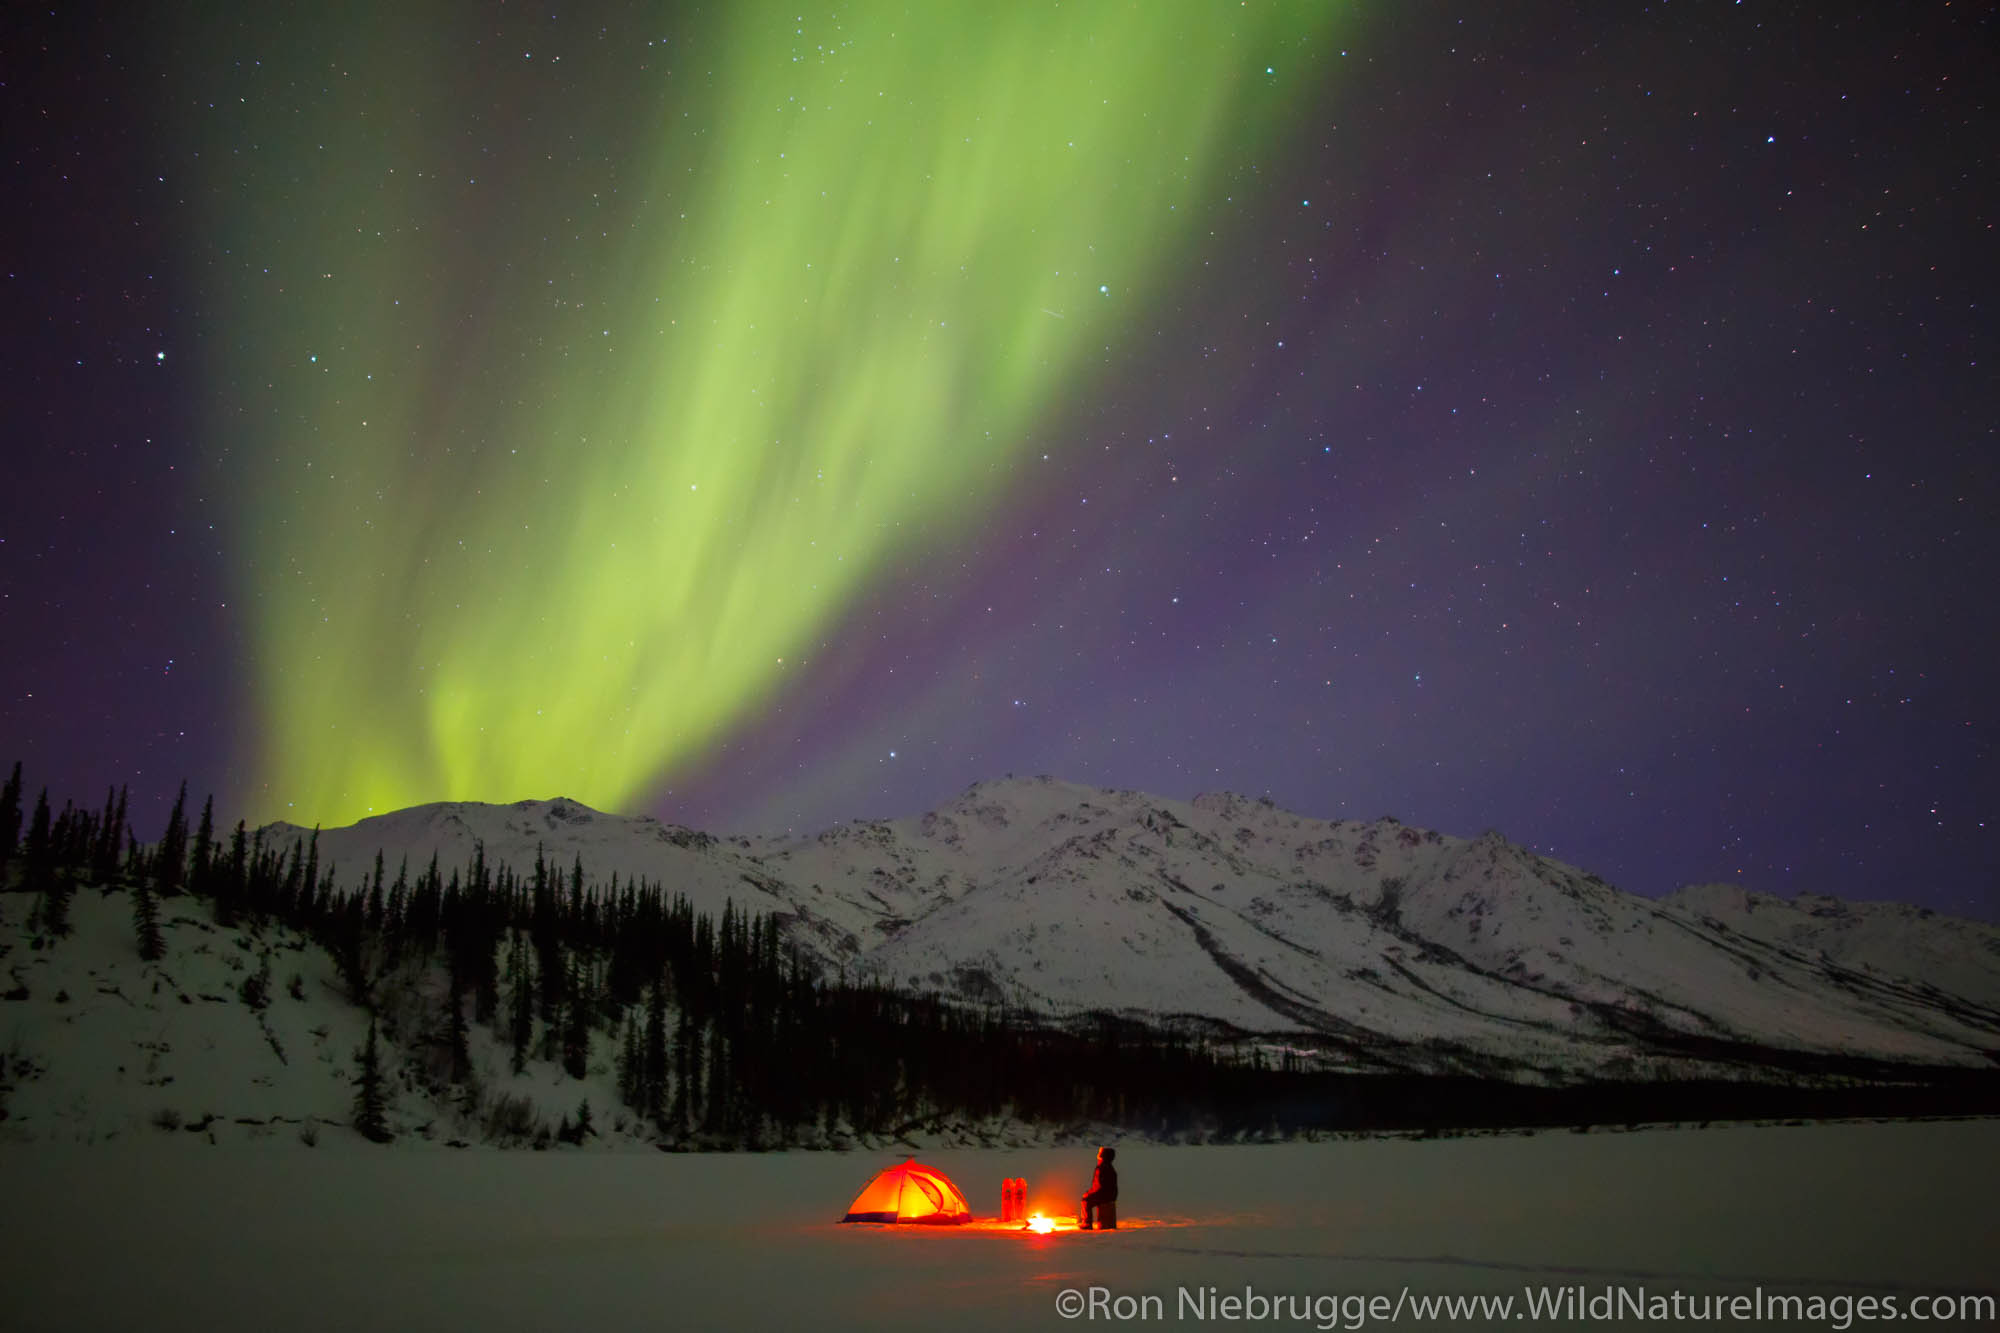 Camping under the Aurora Borealis in the Brooks Range Alaska.